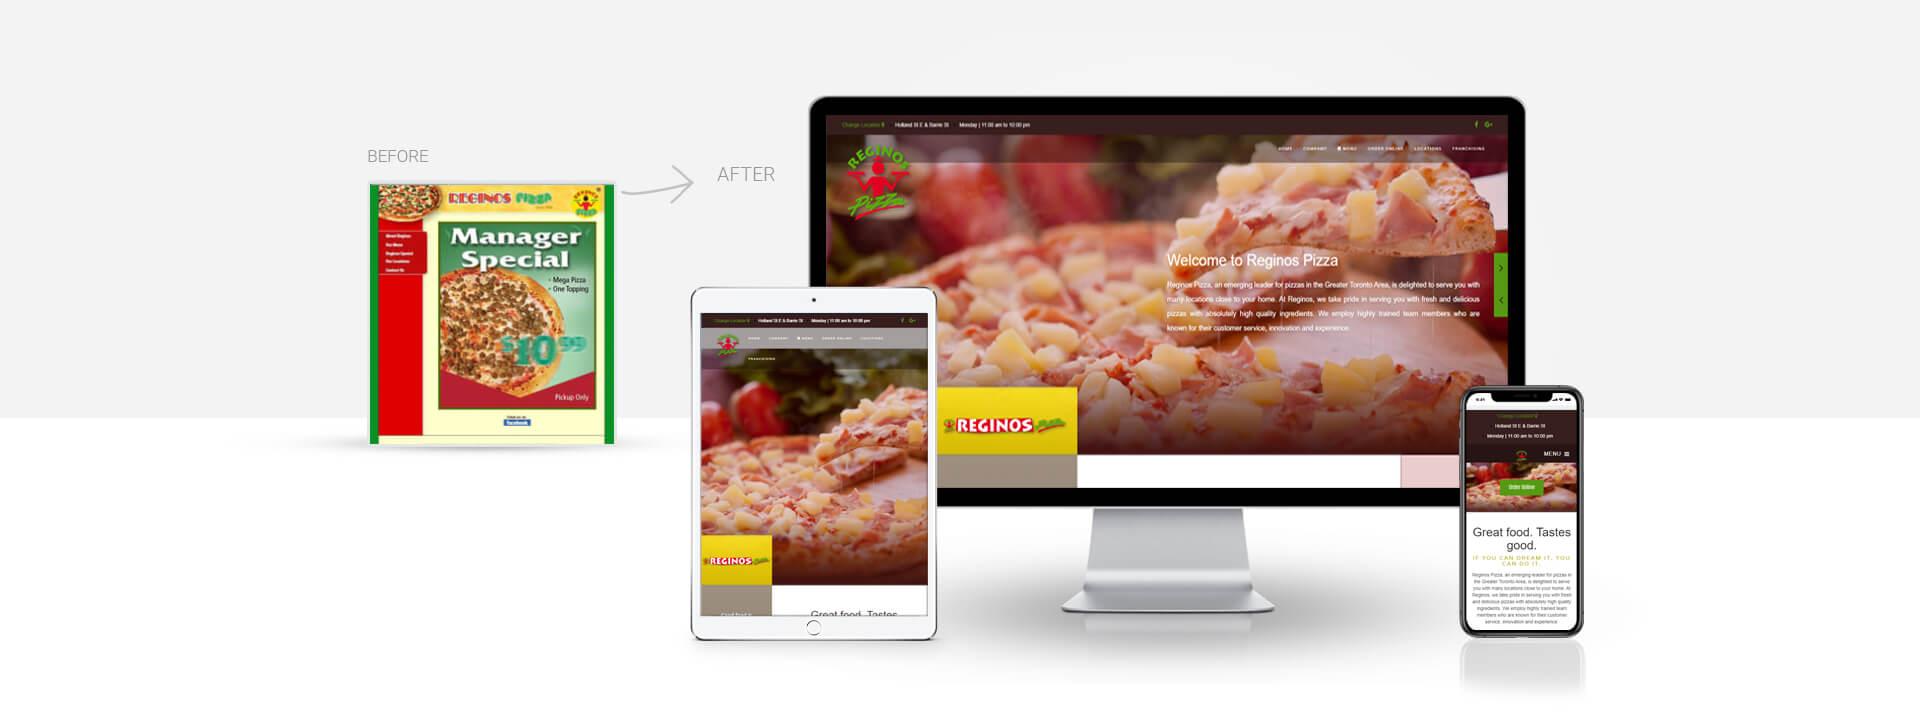 Custom pizza parlour website